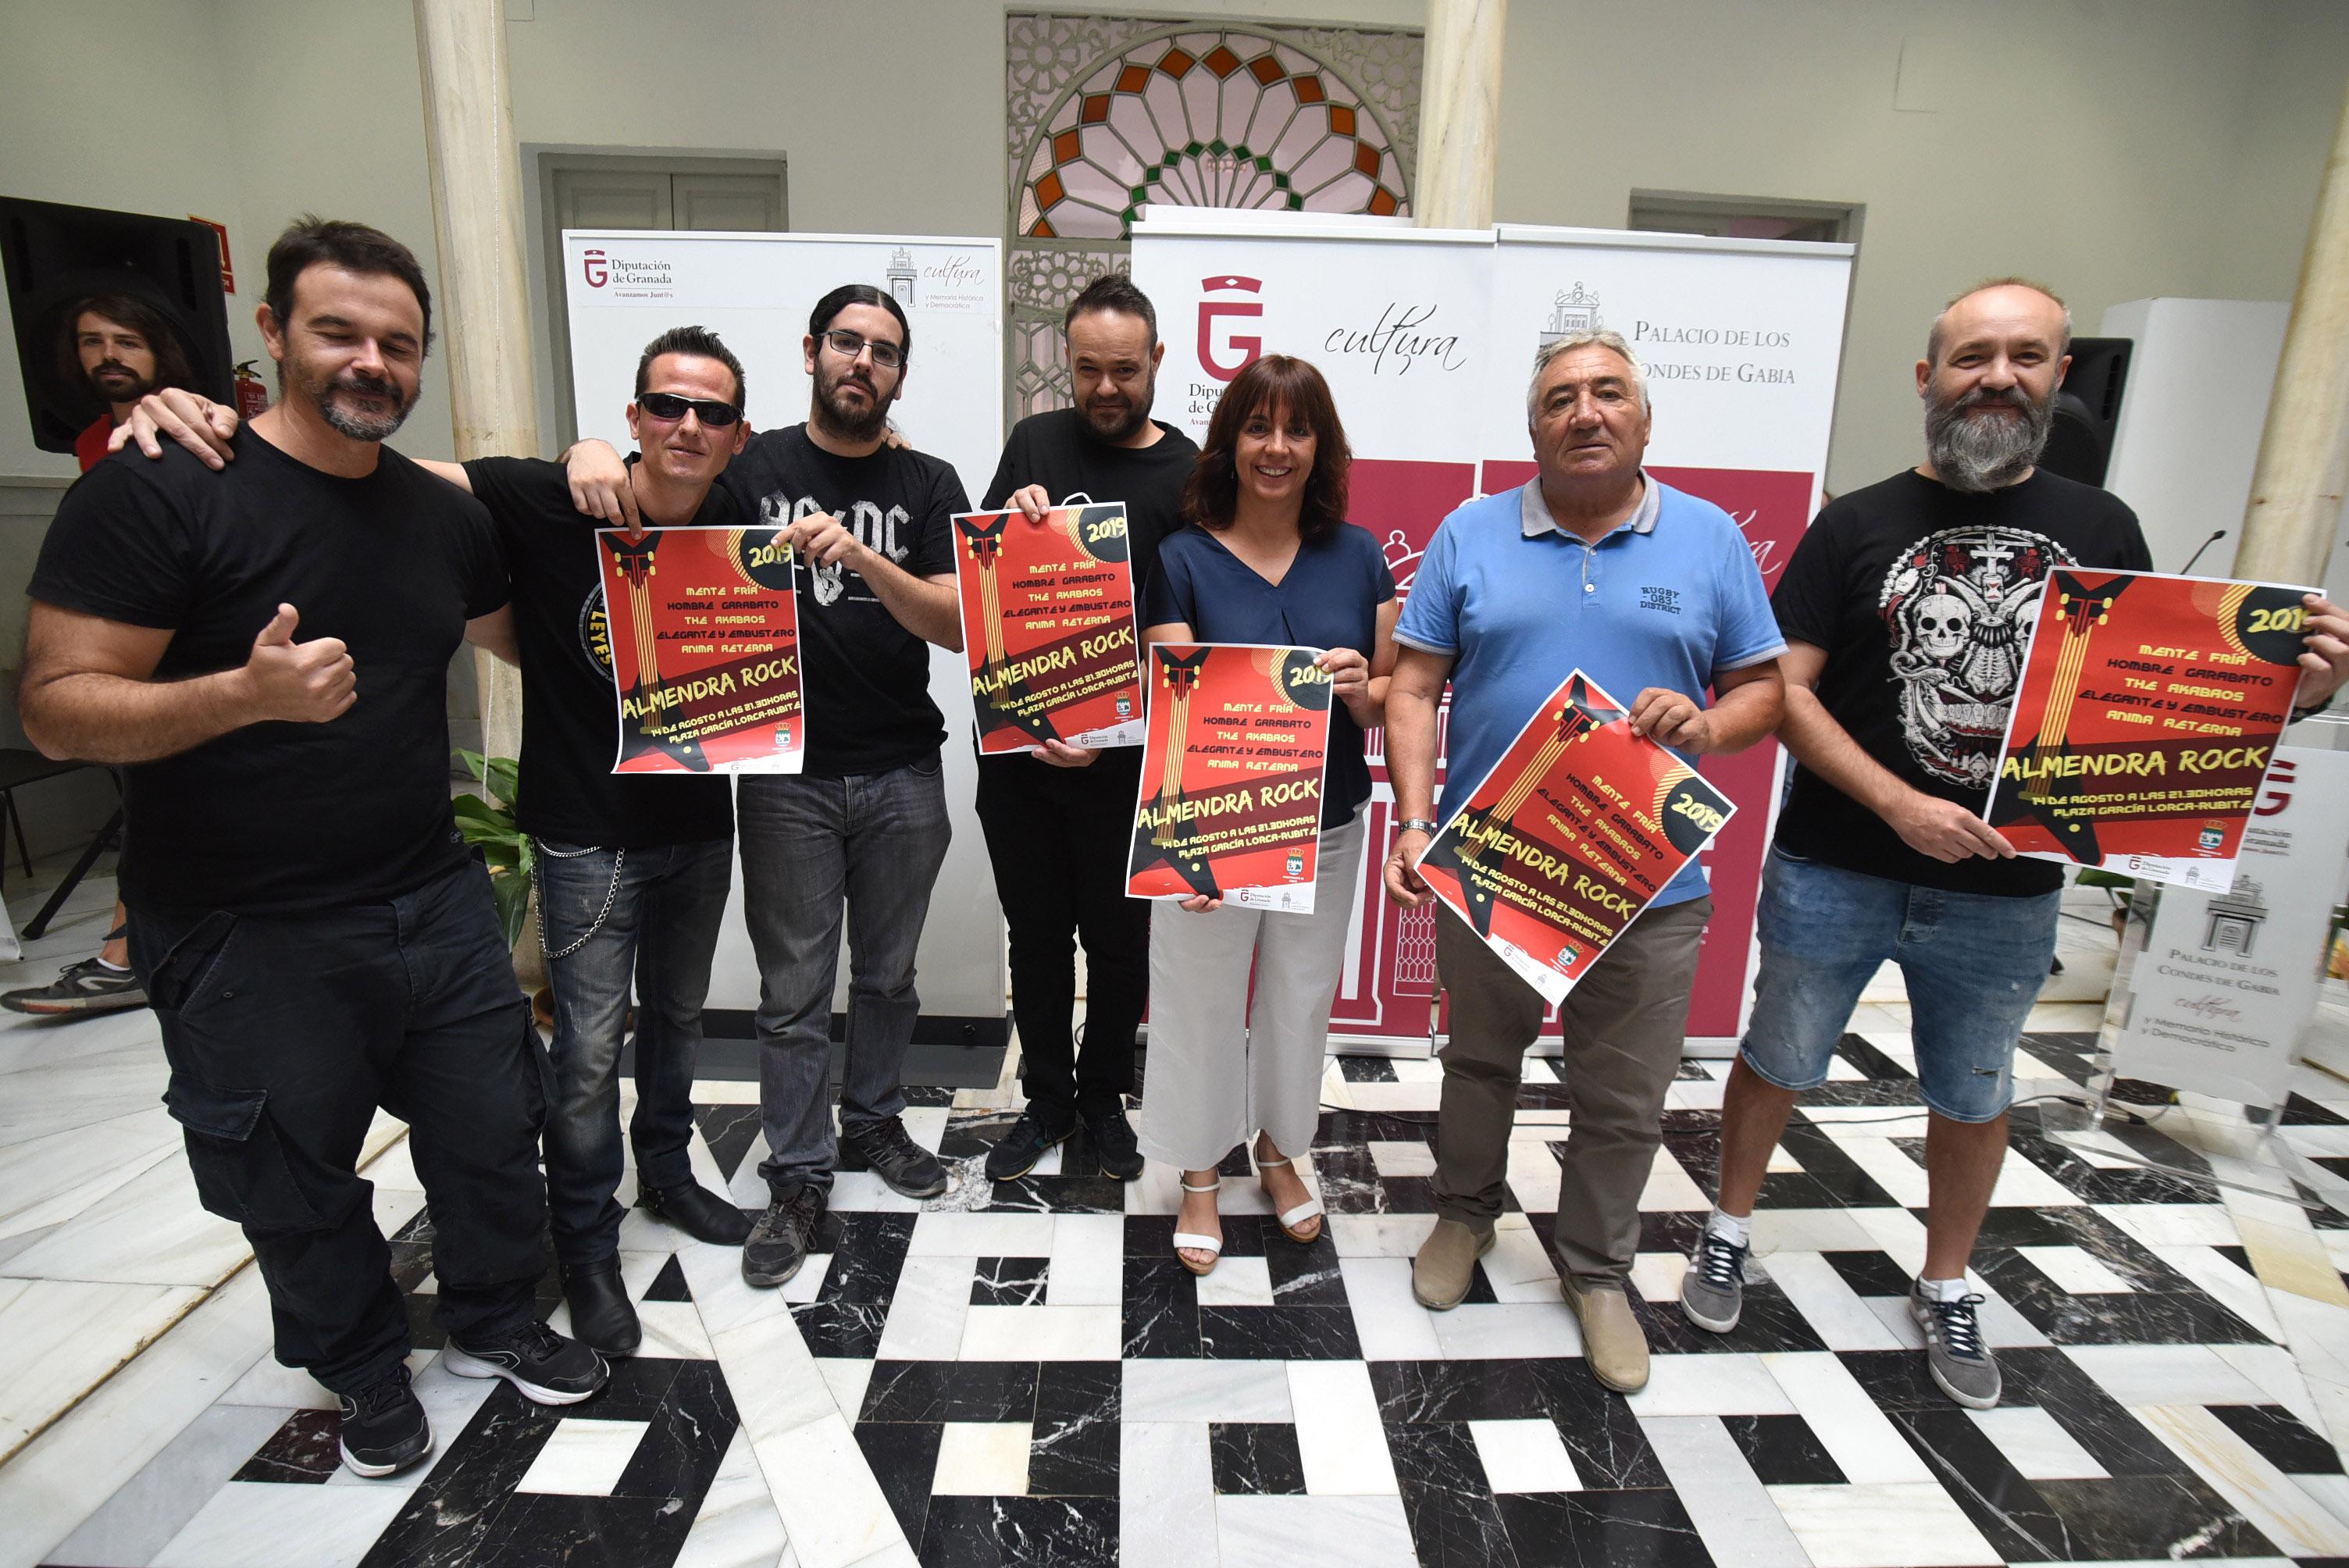 El 'Almendra Rock' vuelve a Rubite para promocionar lo mejor de la música local